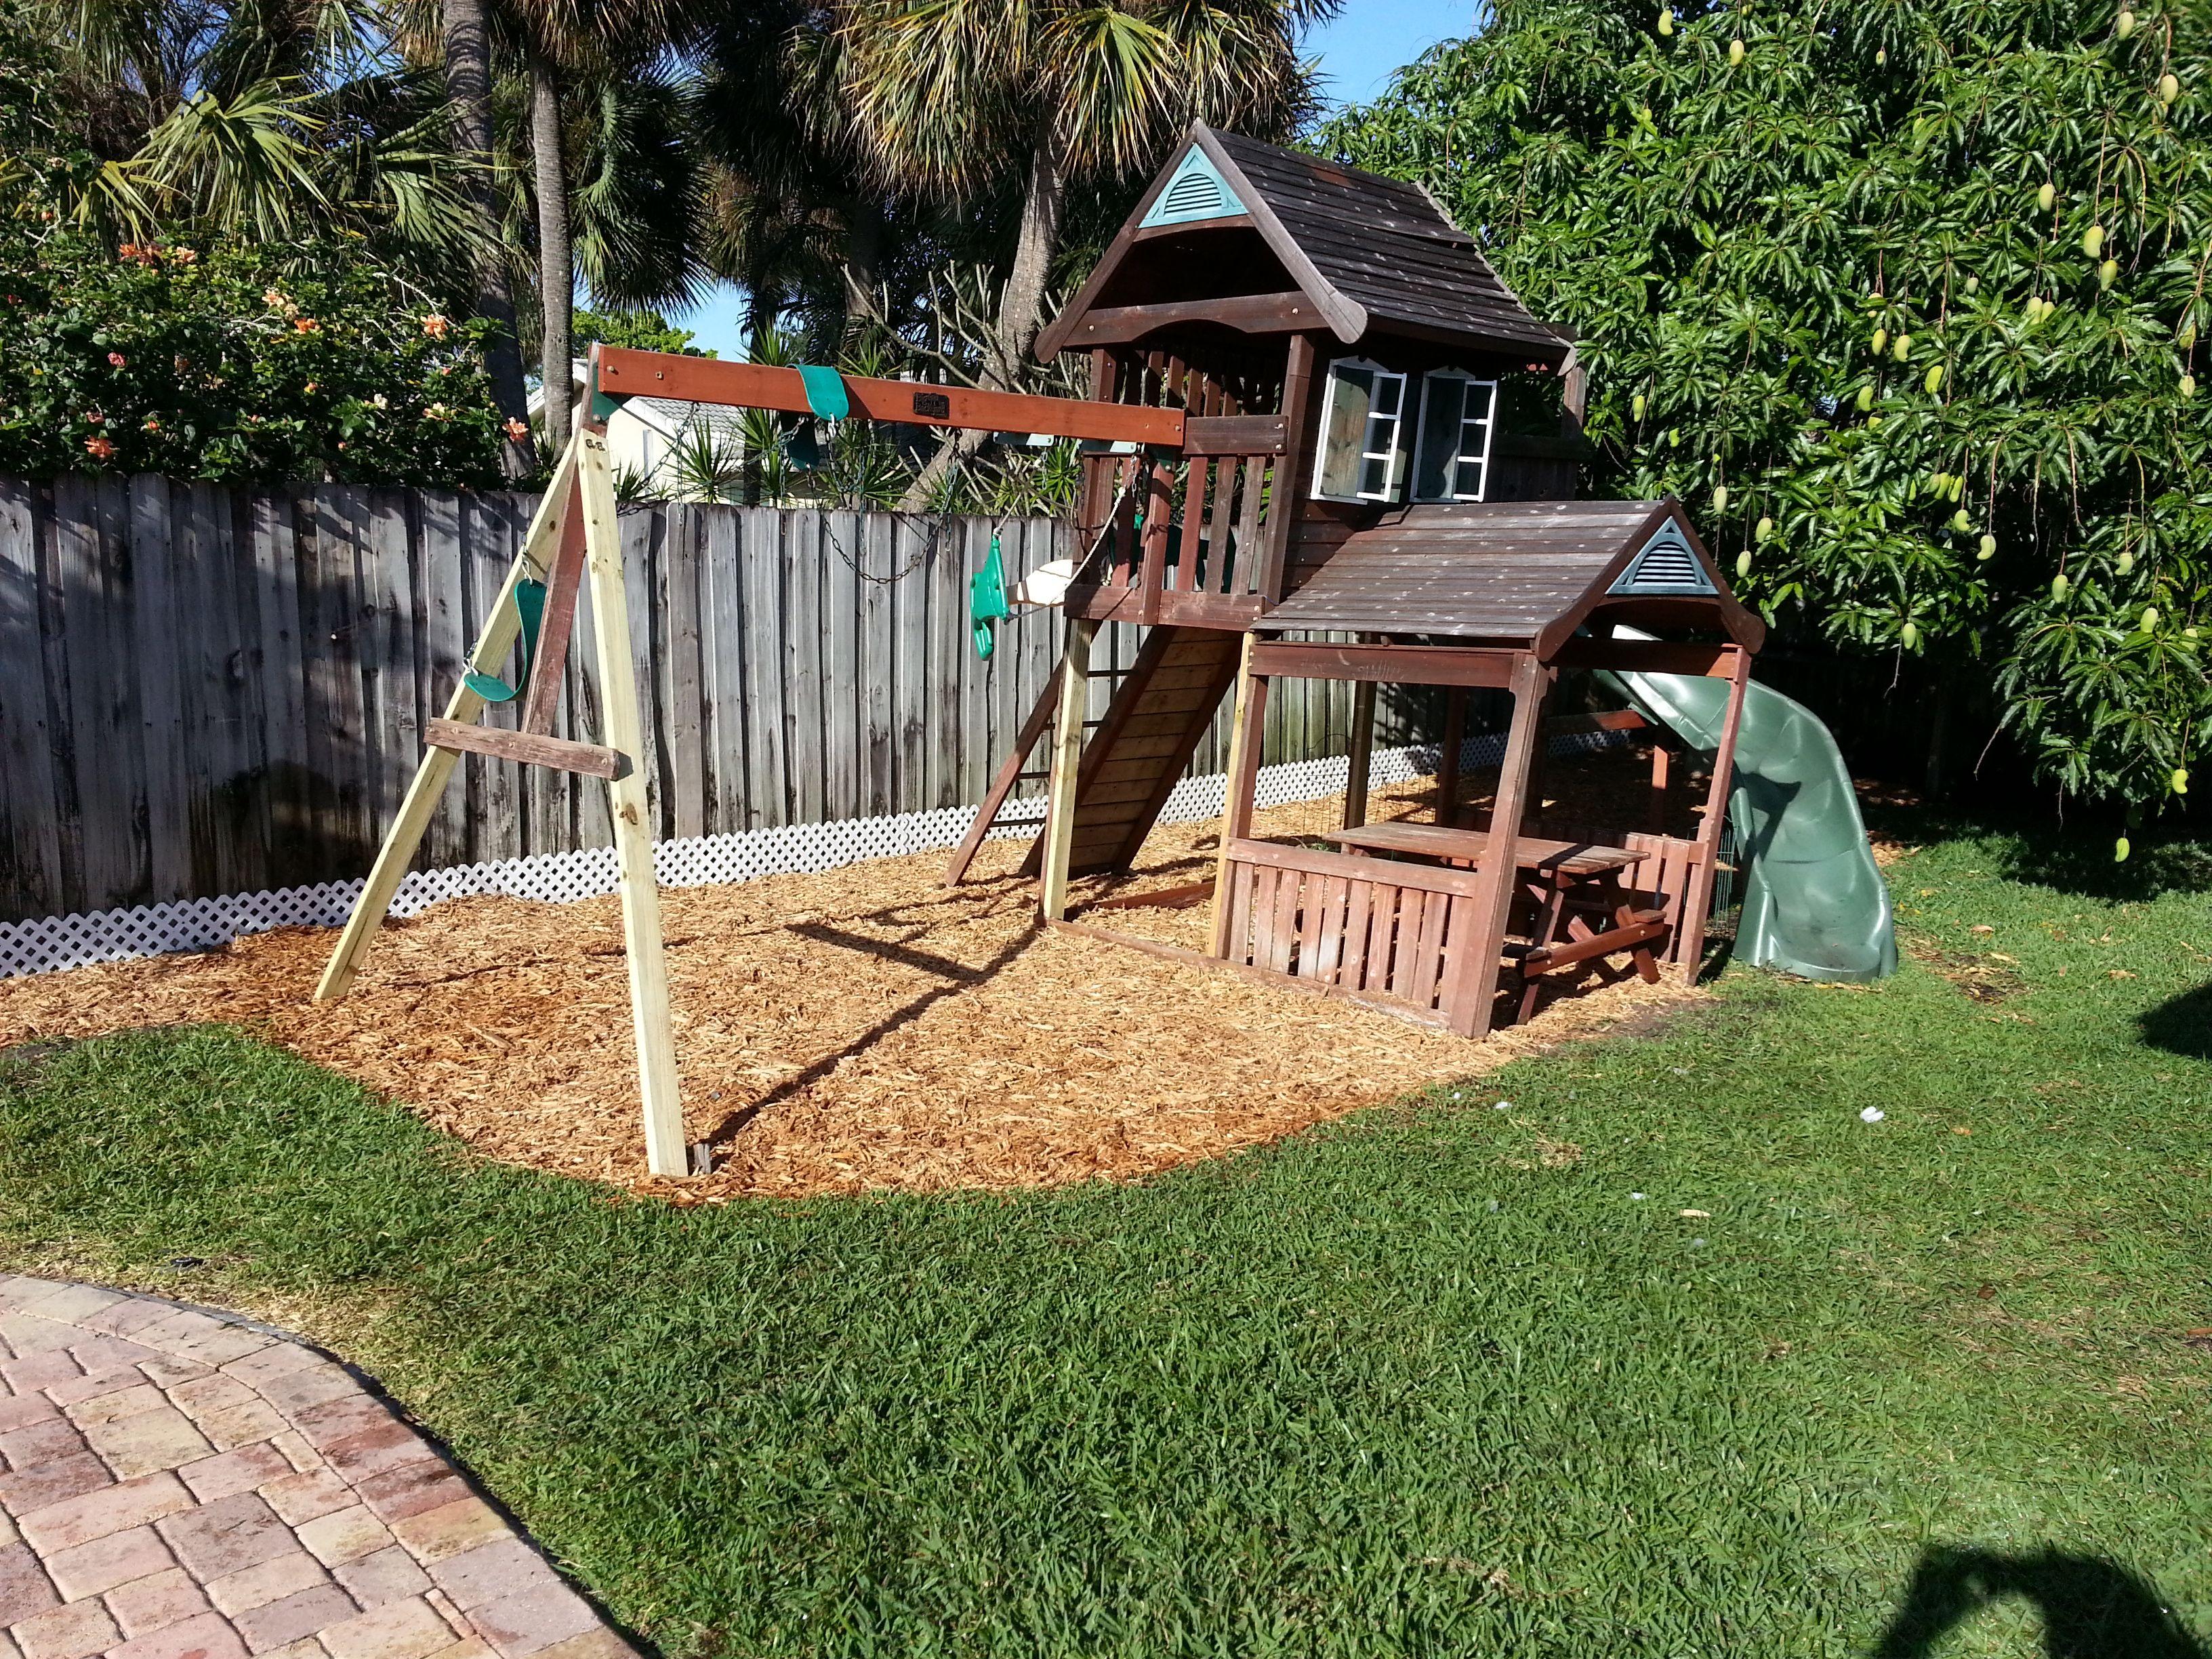 Backyard Playground Ground Cover : Backyard+Playground Backyard playground  Community Beautification